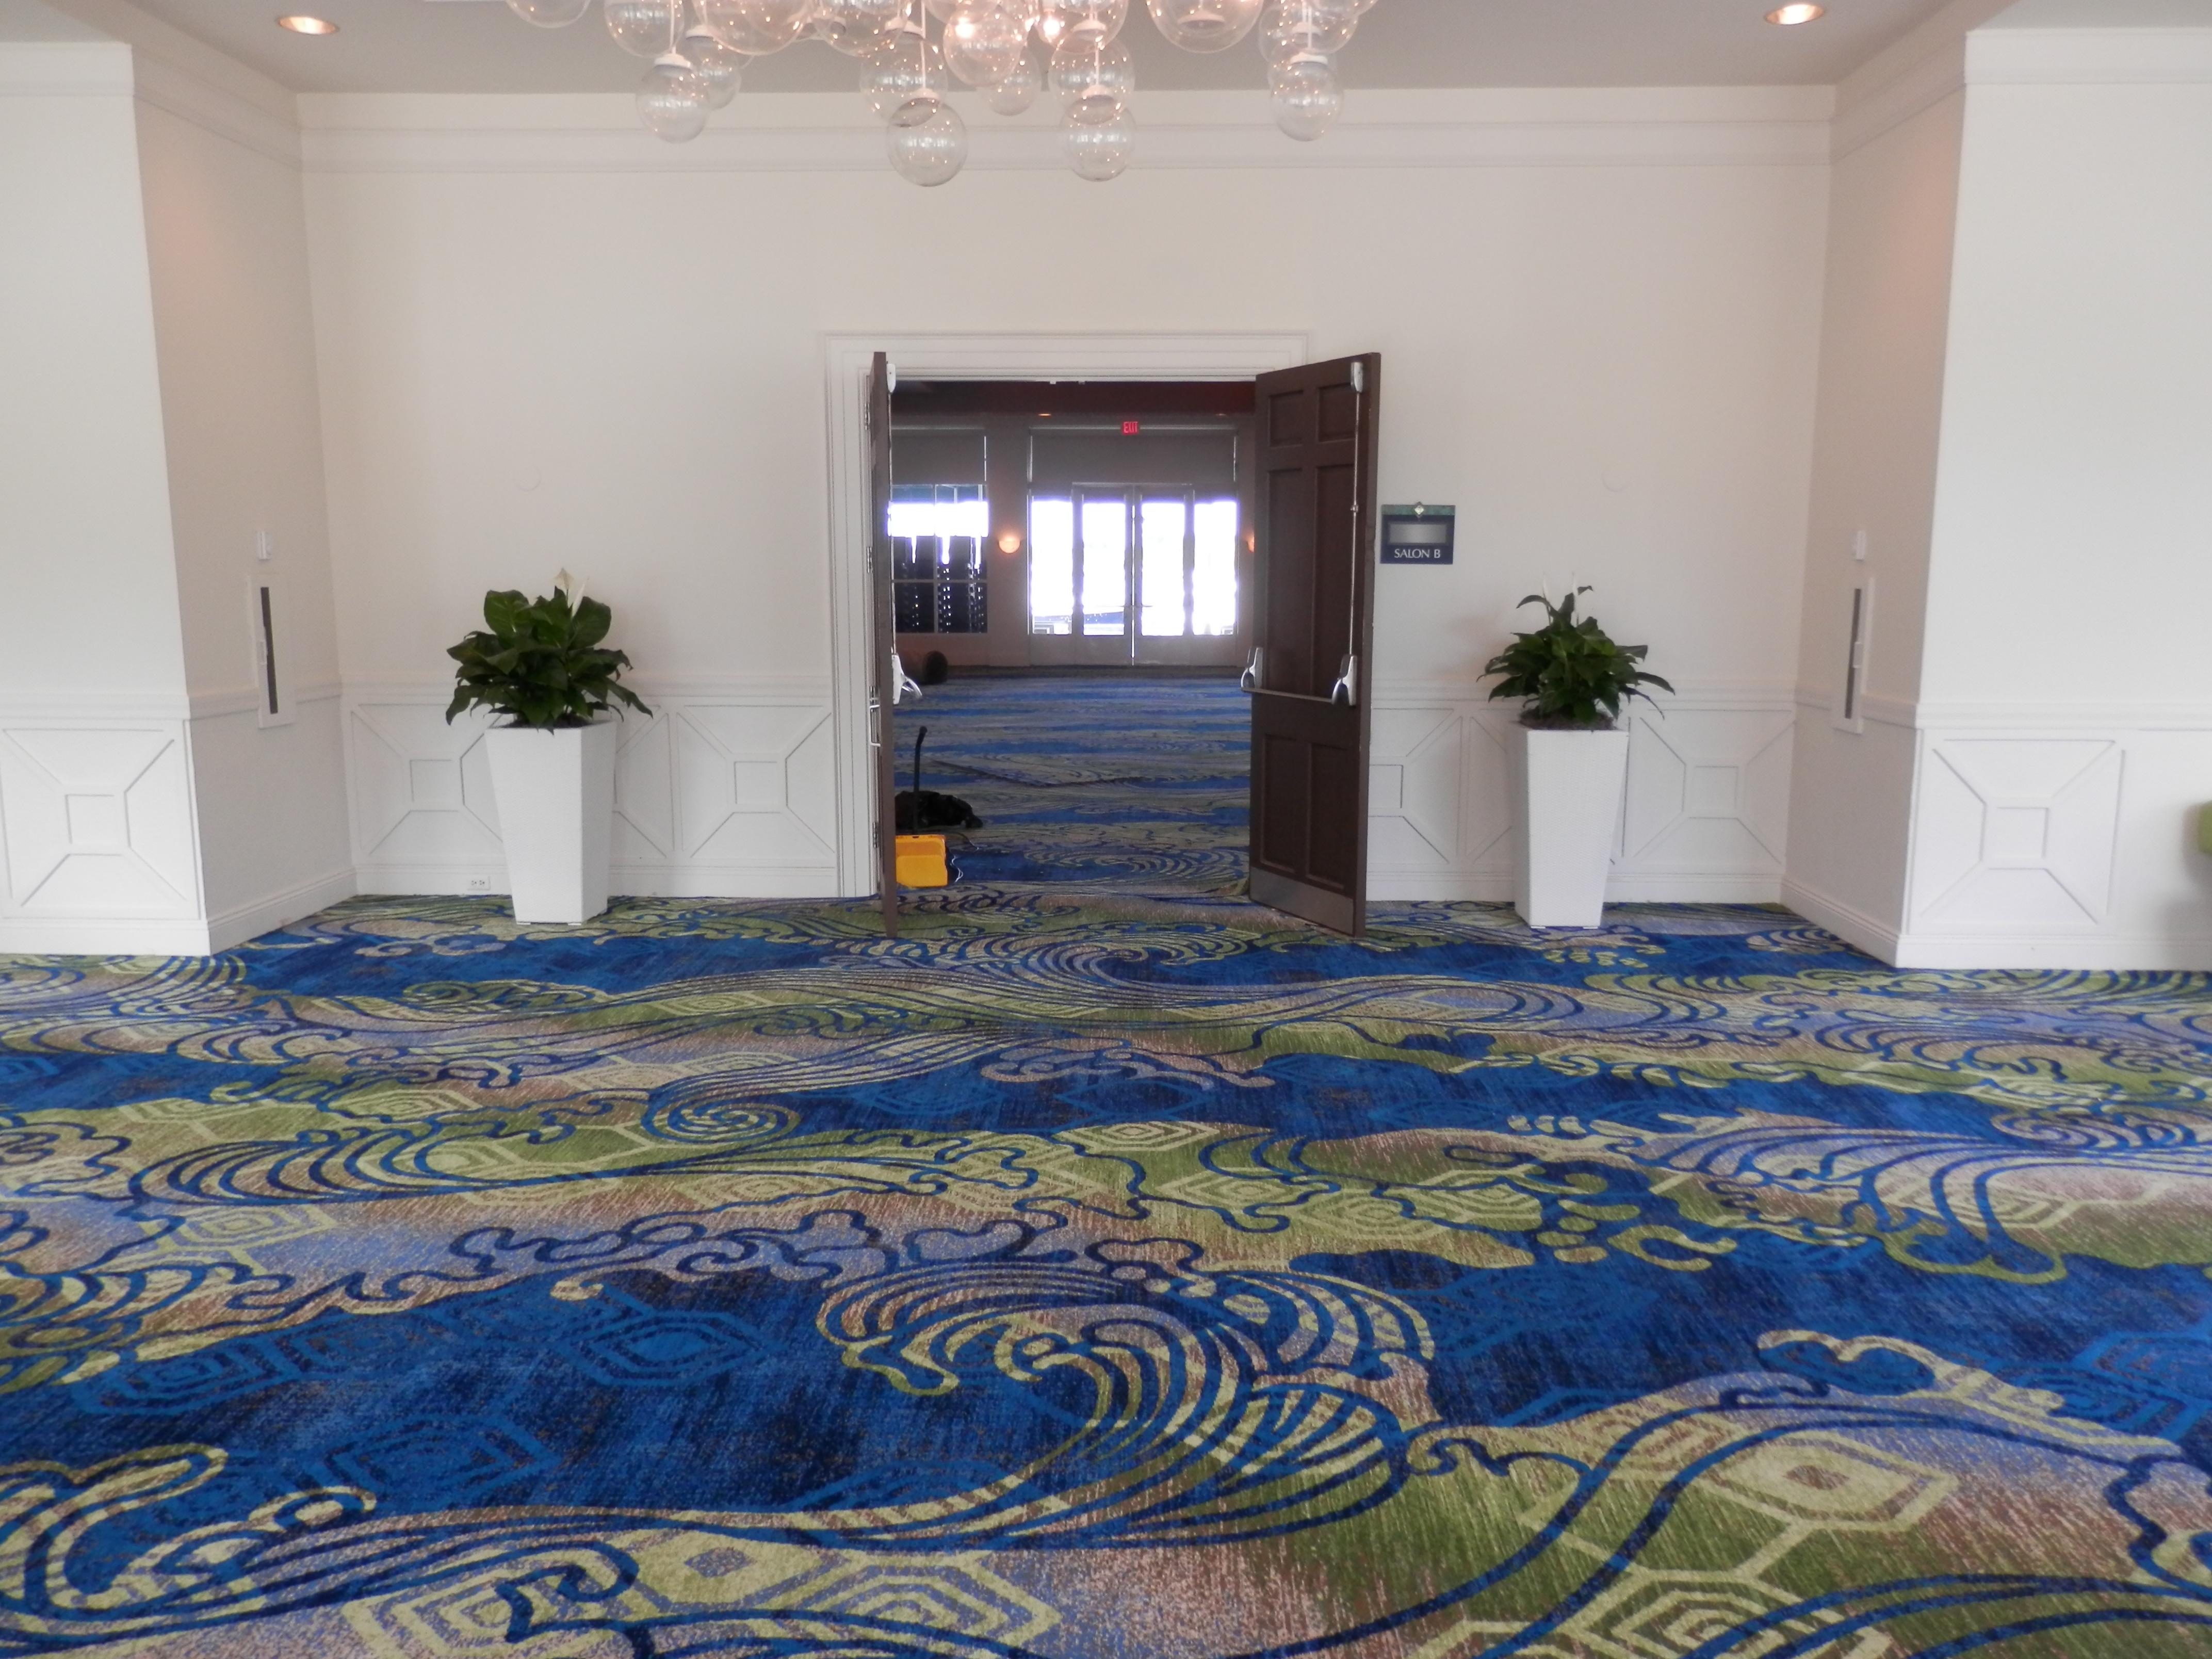 Hassan S Binding Amp Carpet Inc Coupons Near Me In Wilton